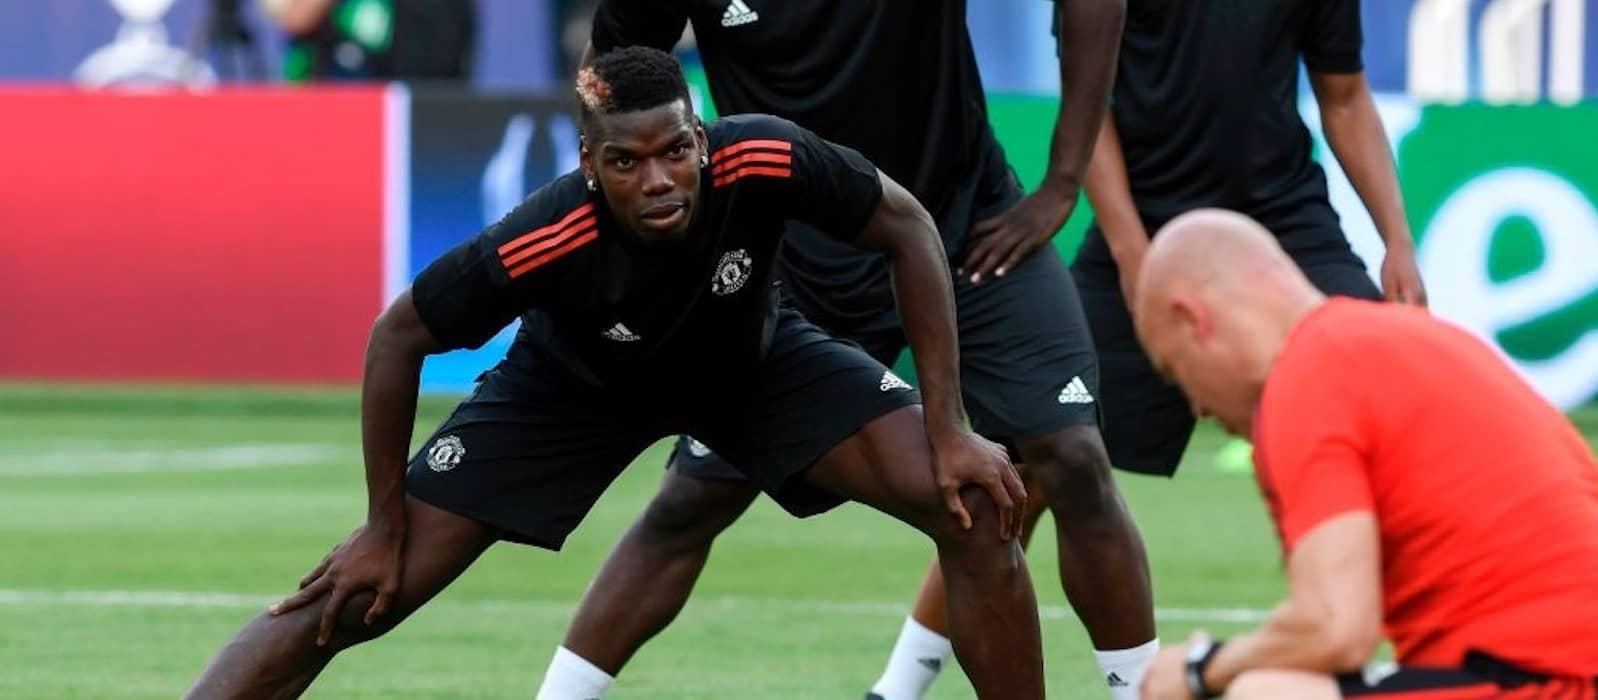 Zinedine Zidane still determined to sign Manchester United's Paul Pogba – report